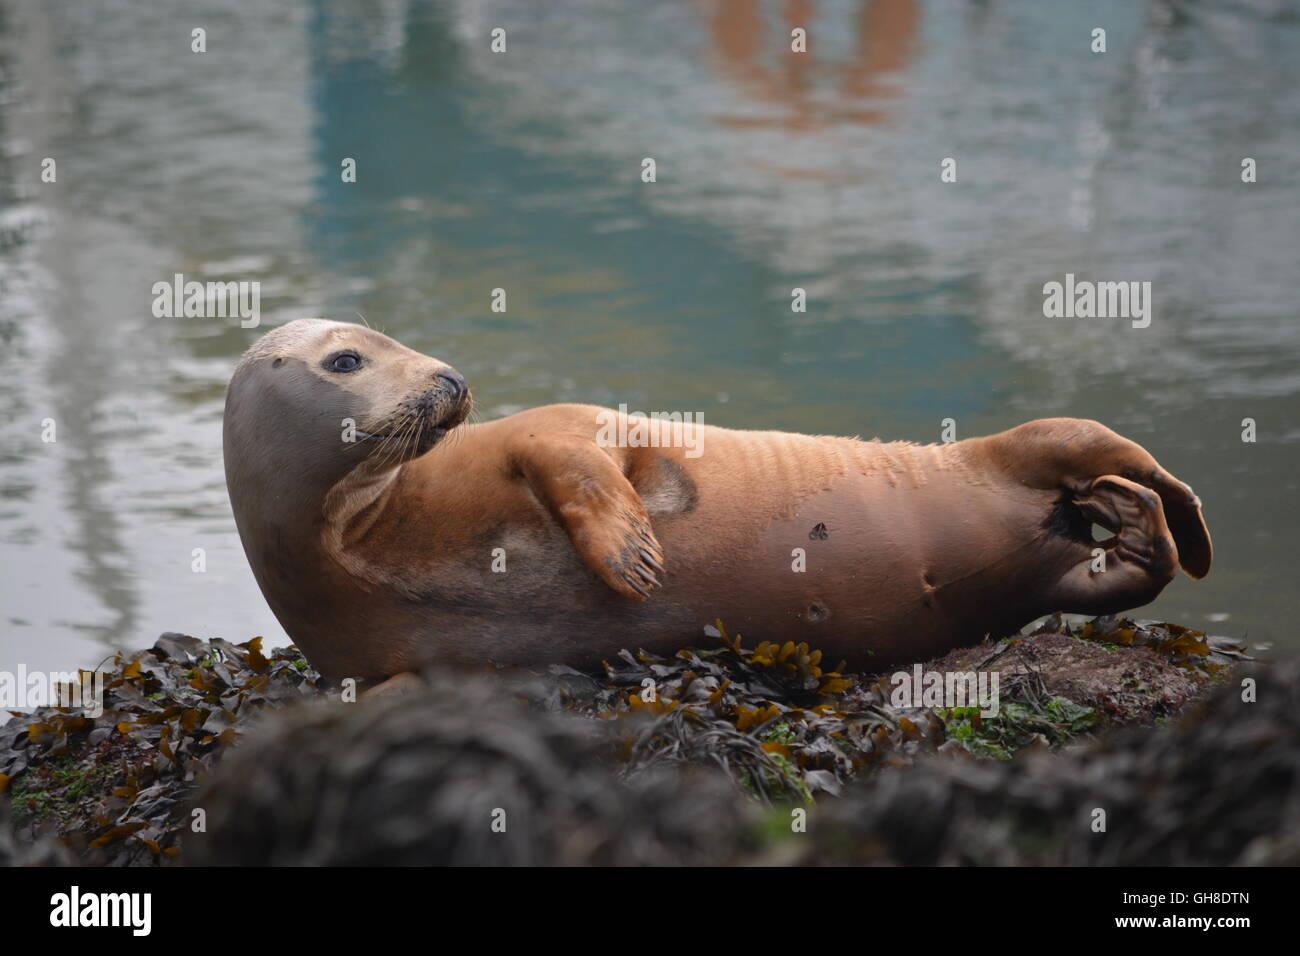 Juvenile grey seal hauled out at Town Quay marina, Southampton in 2016 - Stock Image